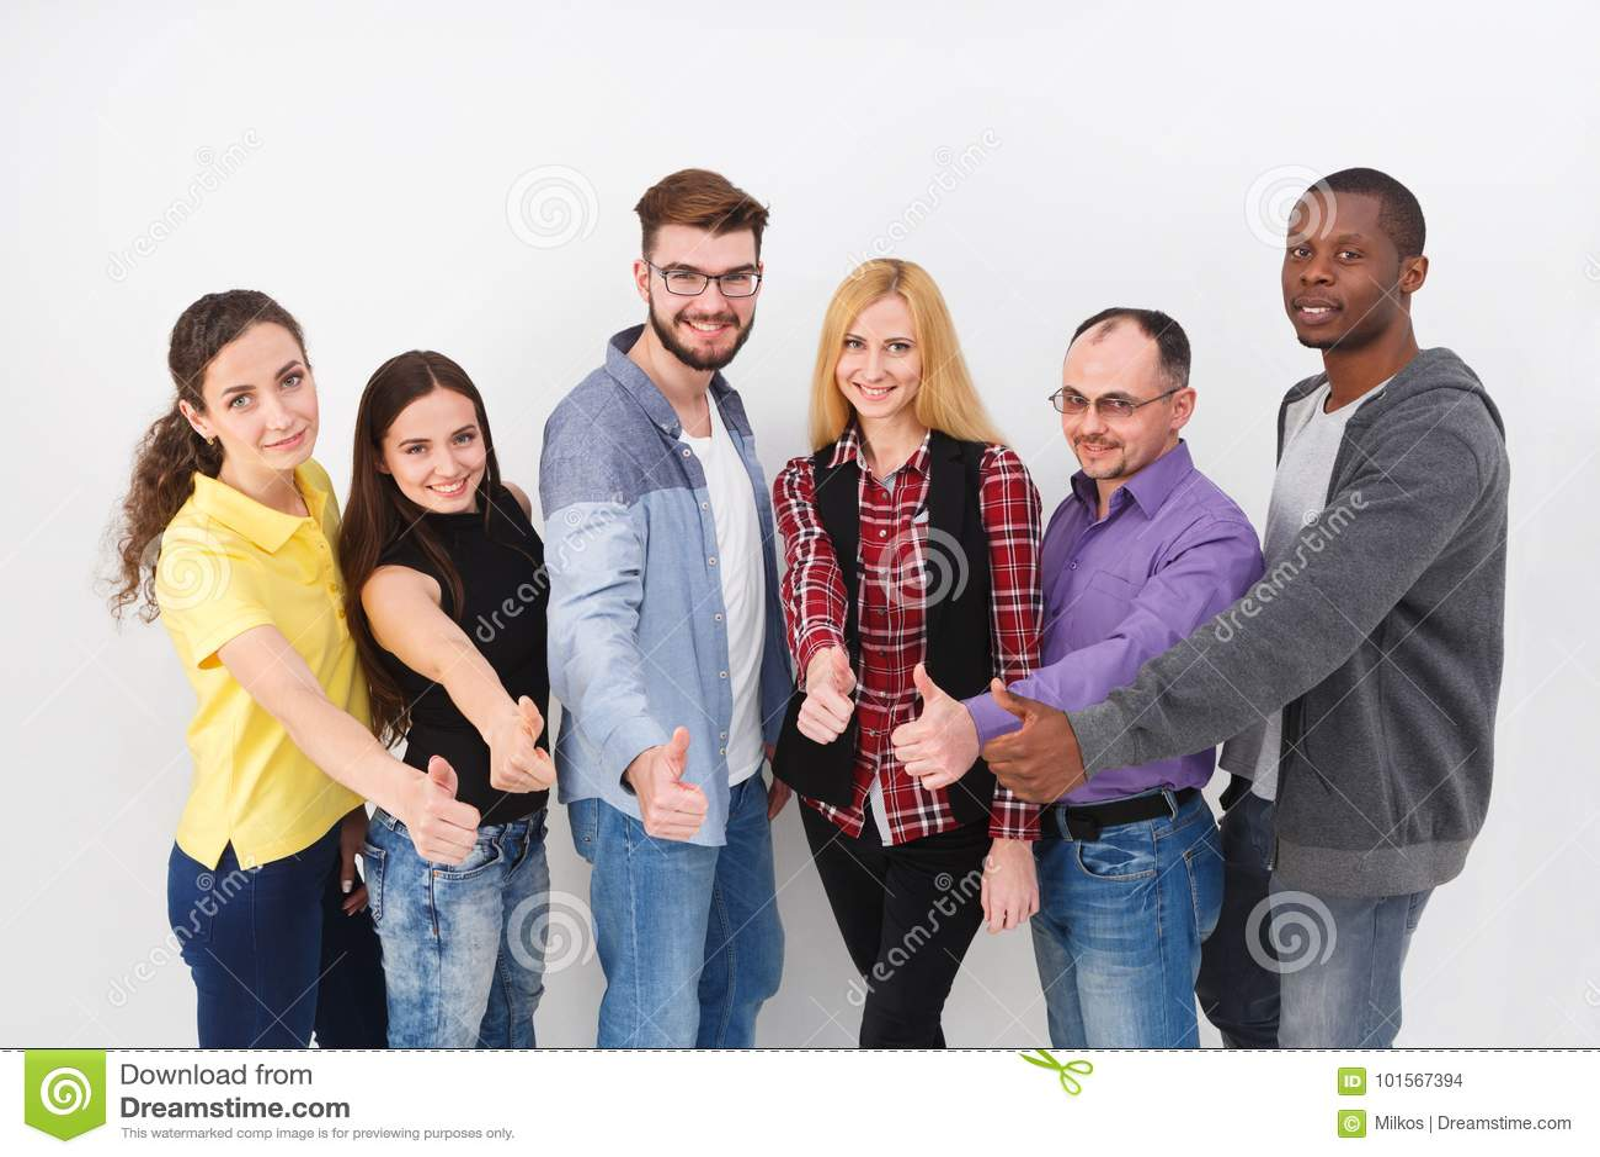 Successful team concept. Confident business people